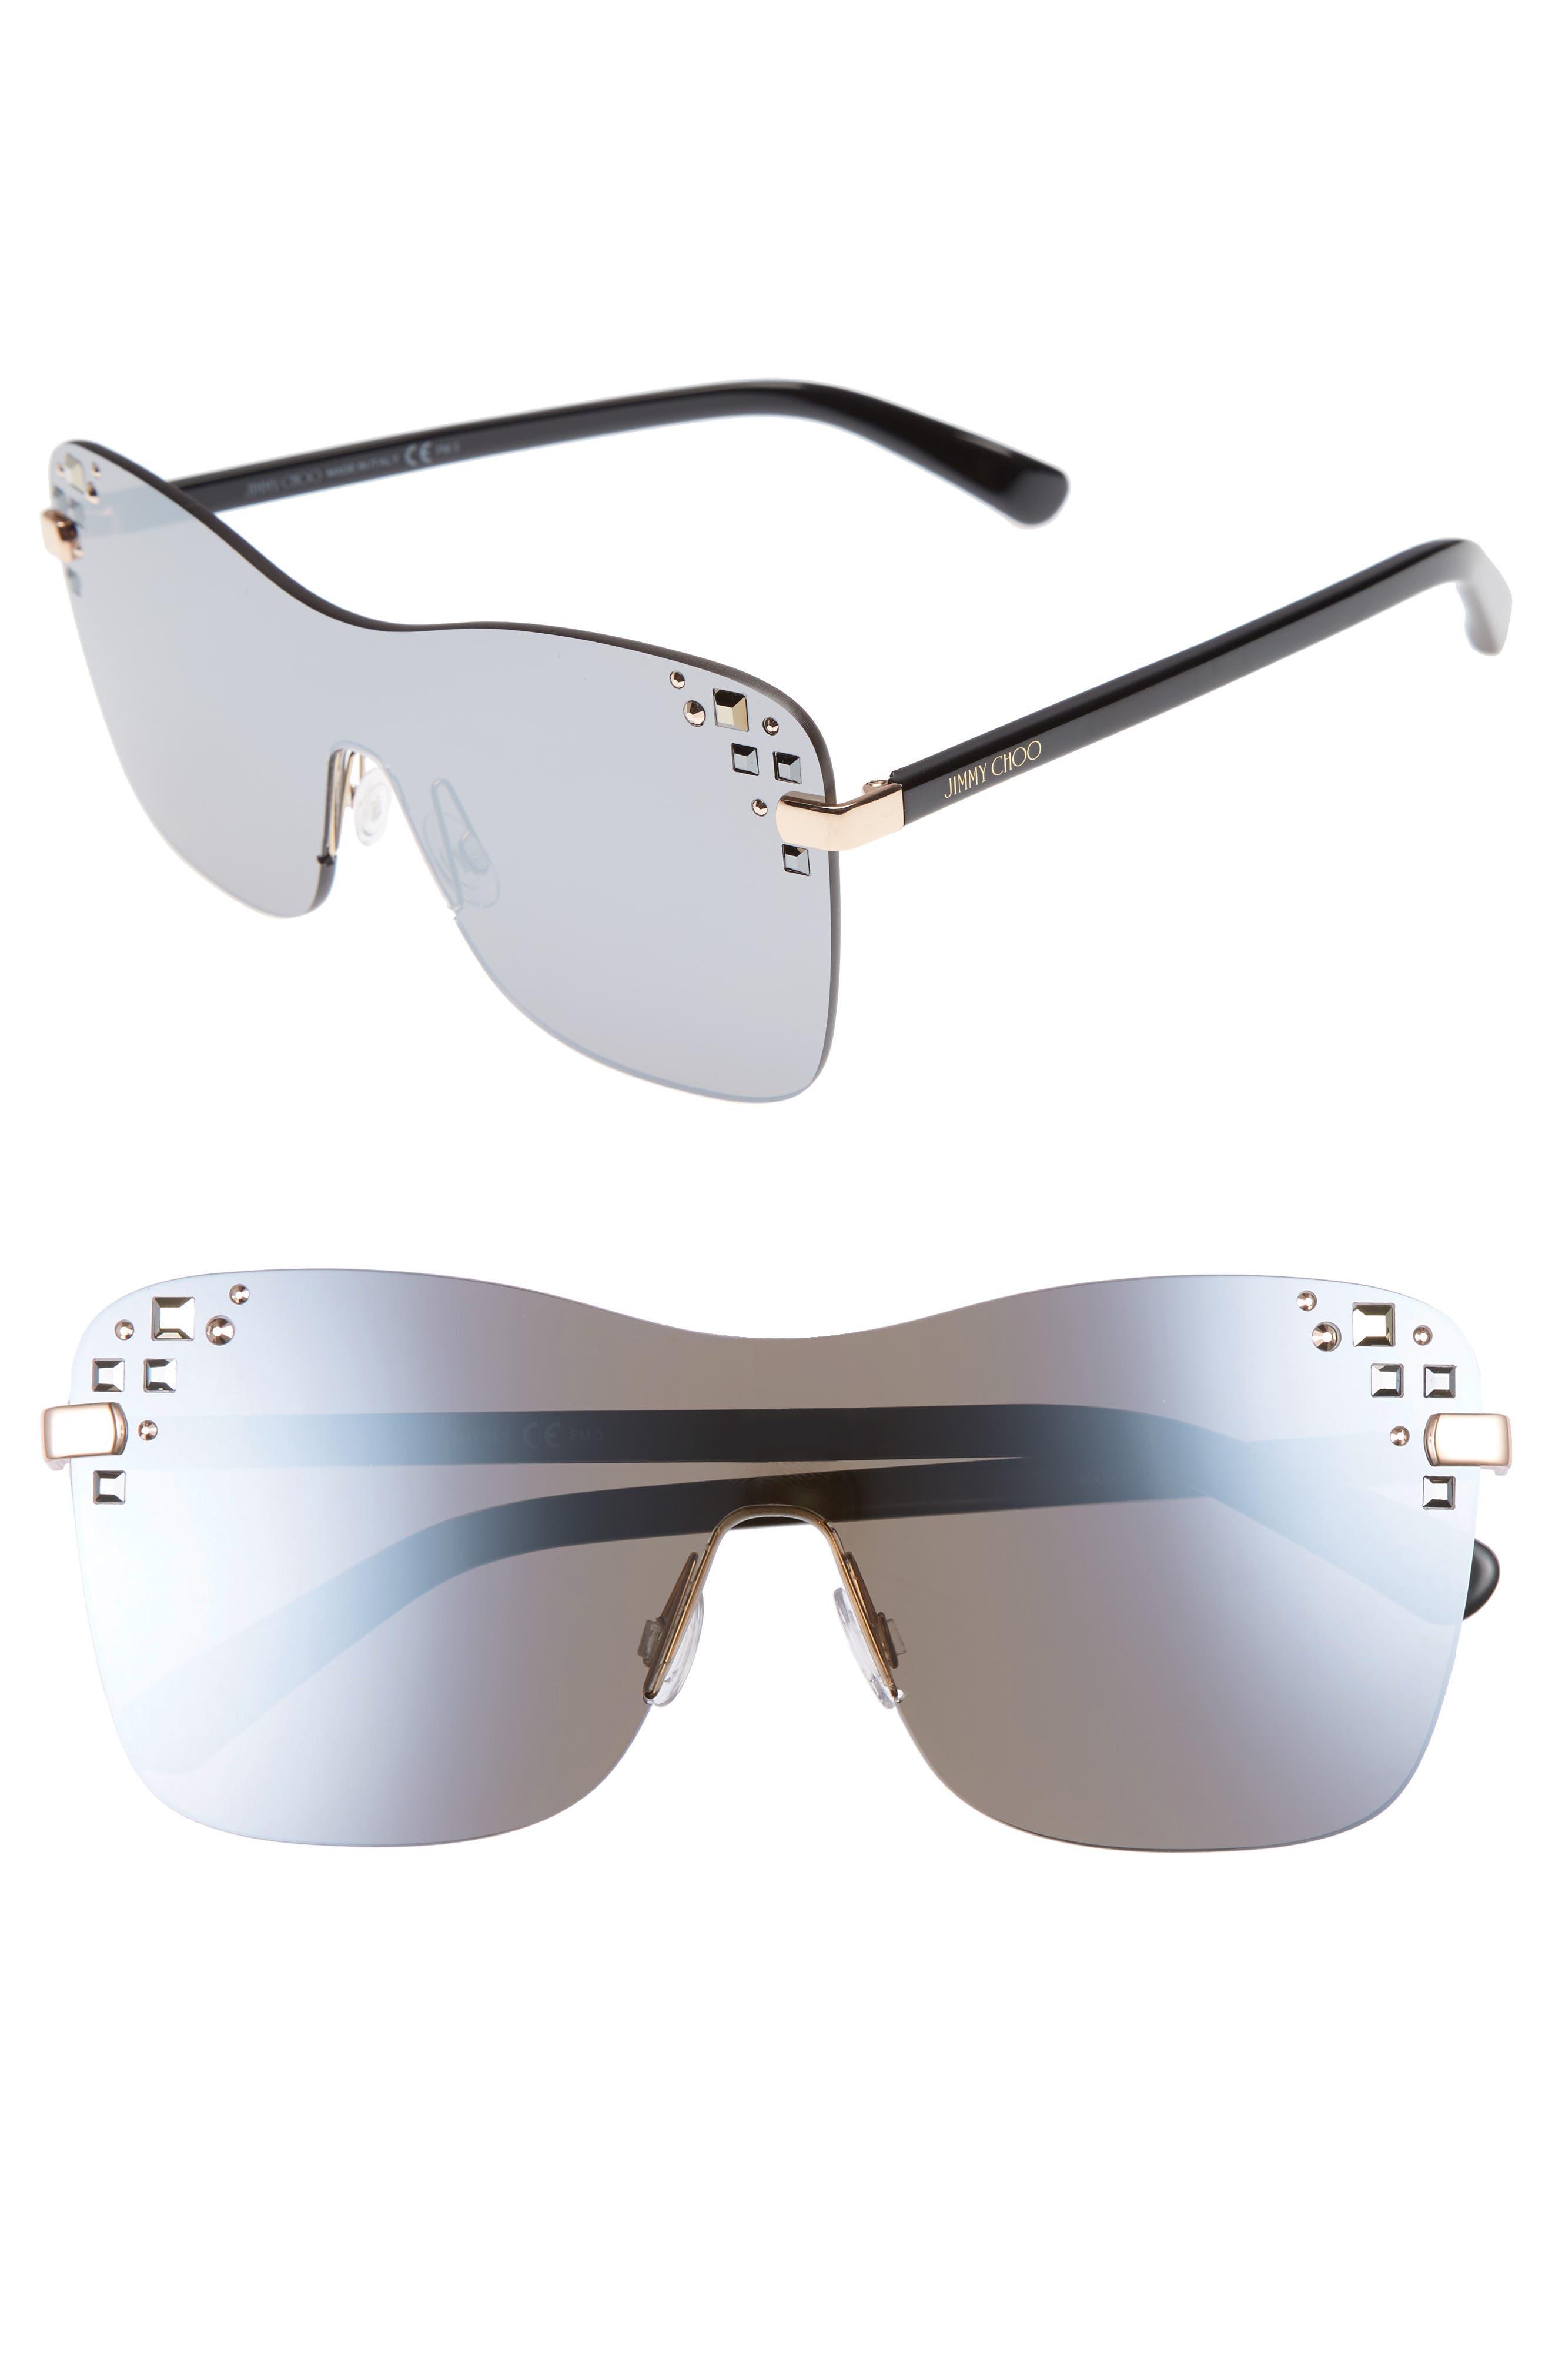 JIMMY CHOO Masks 63mm Rimless Shield Sunglasses